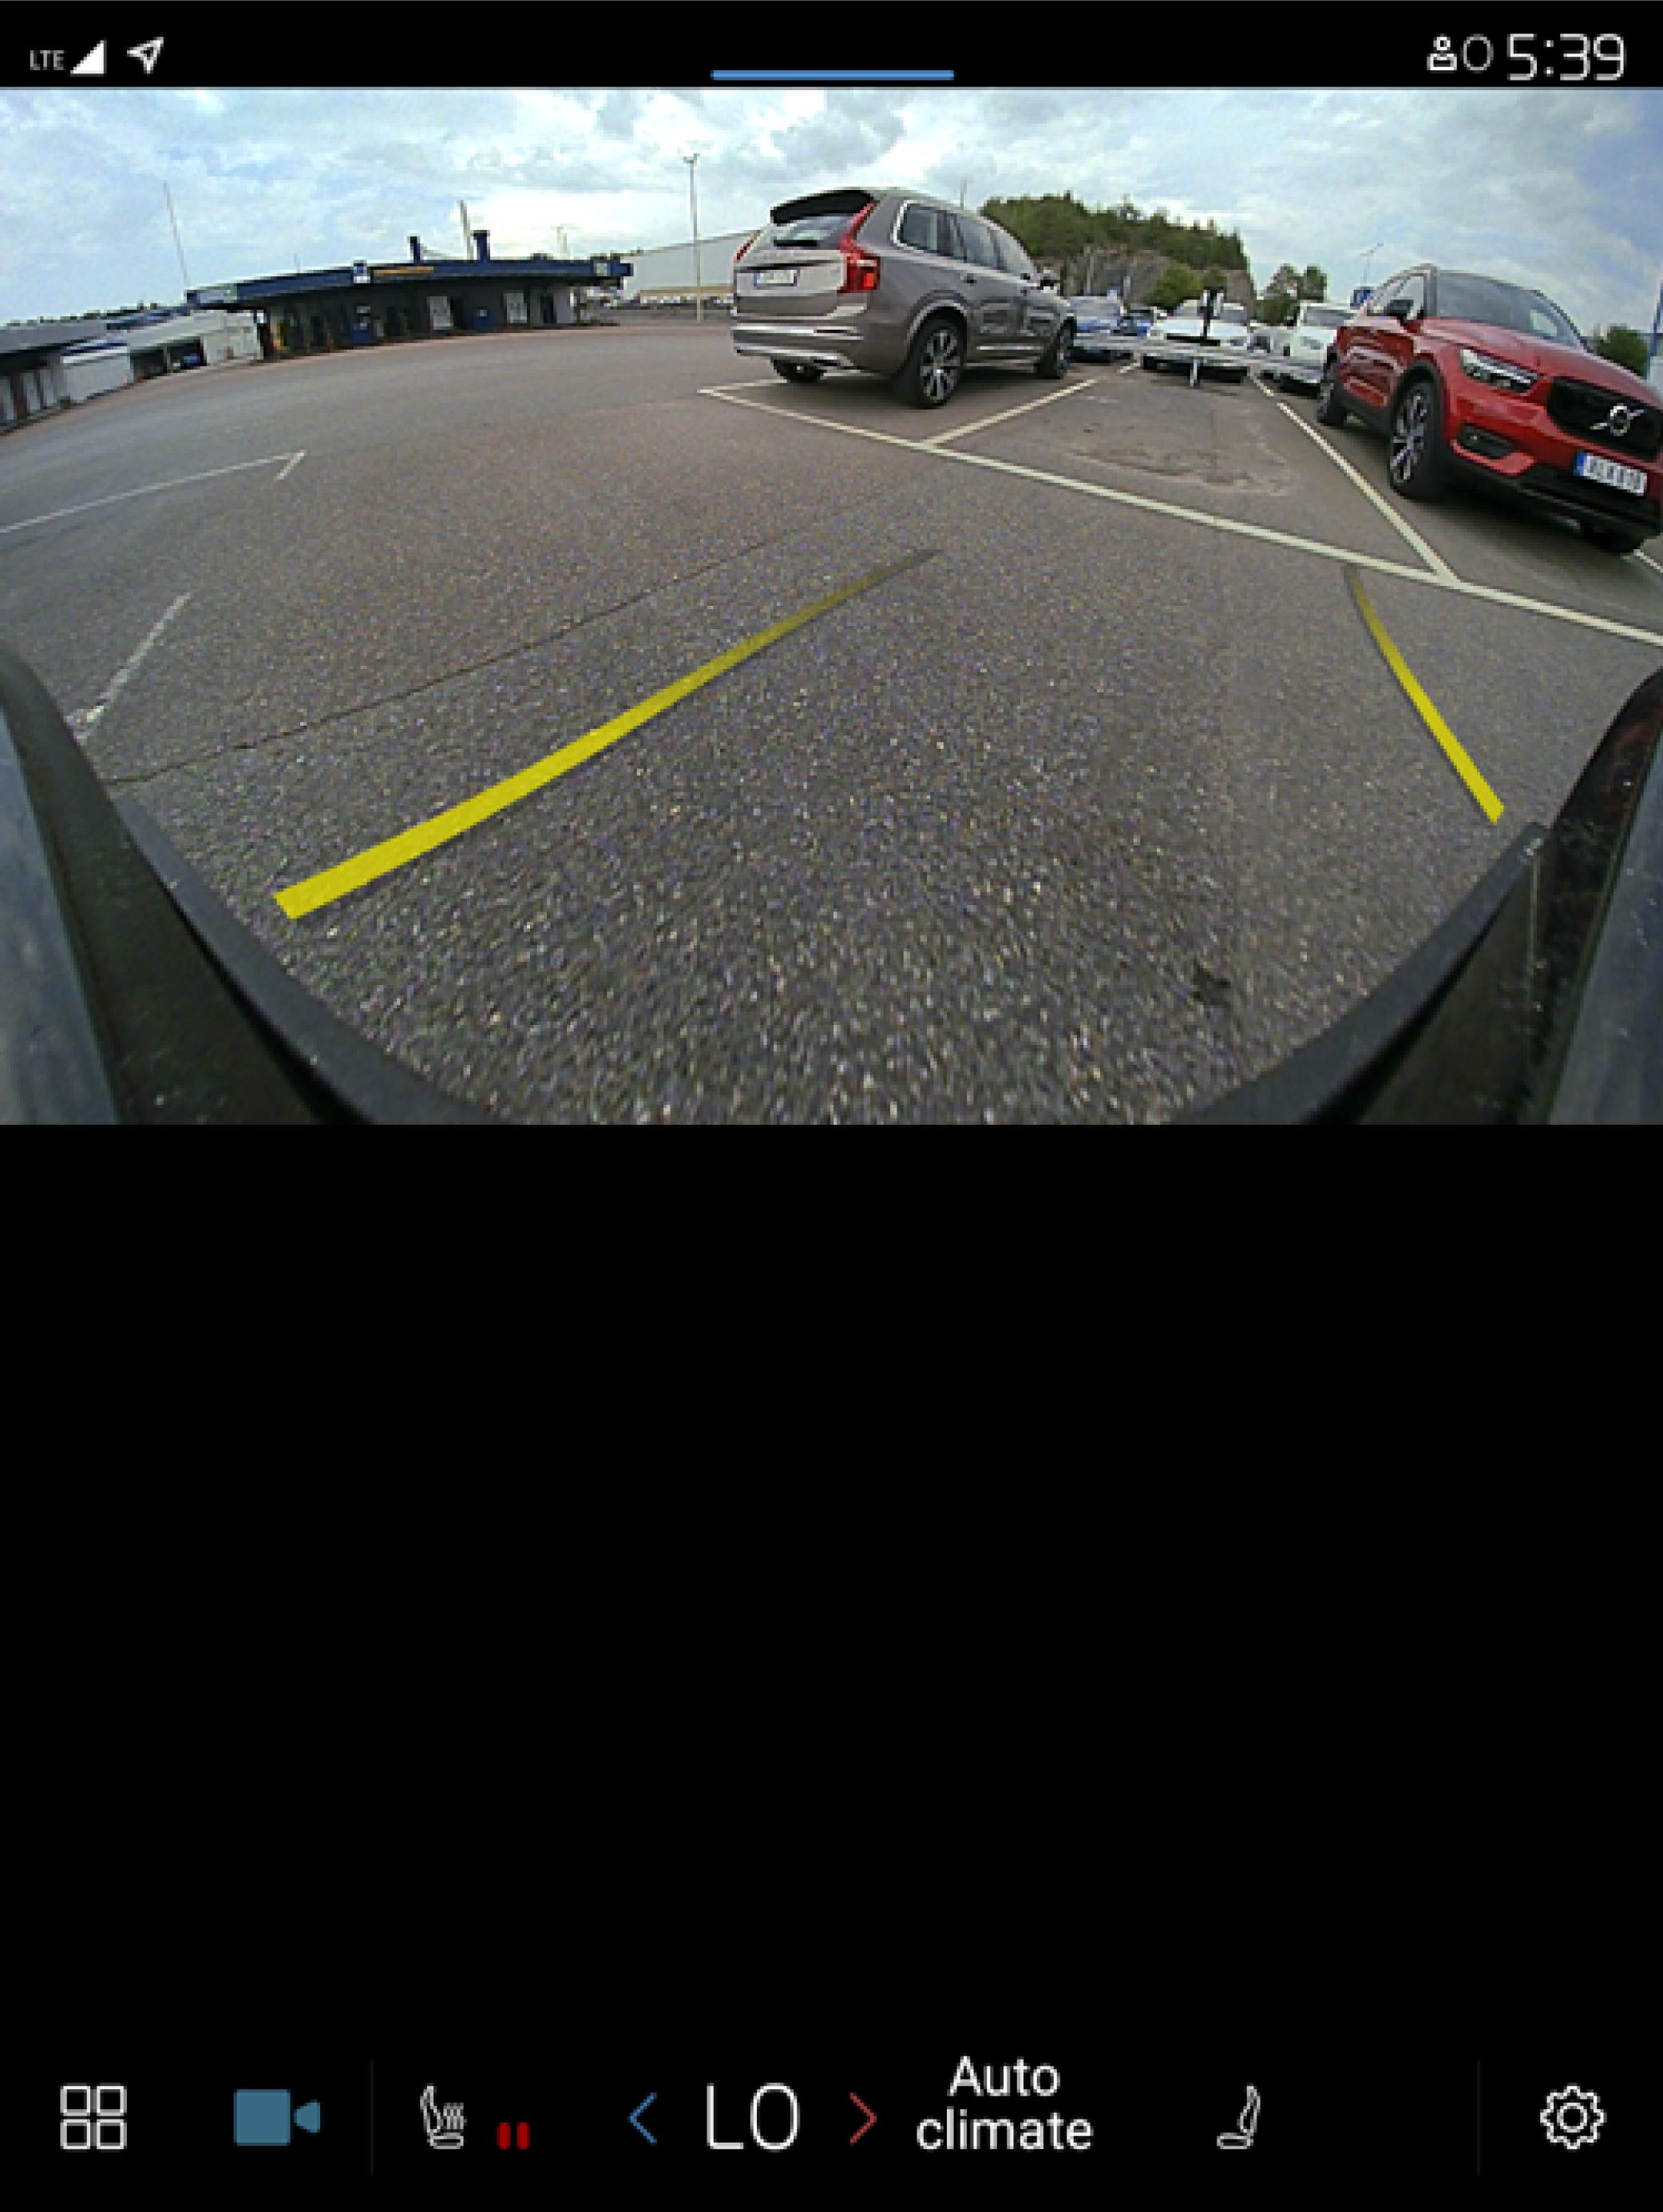 Px-2037-iCup-Park Assist Camera helplines